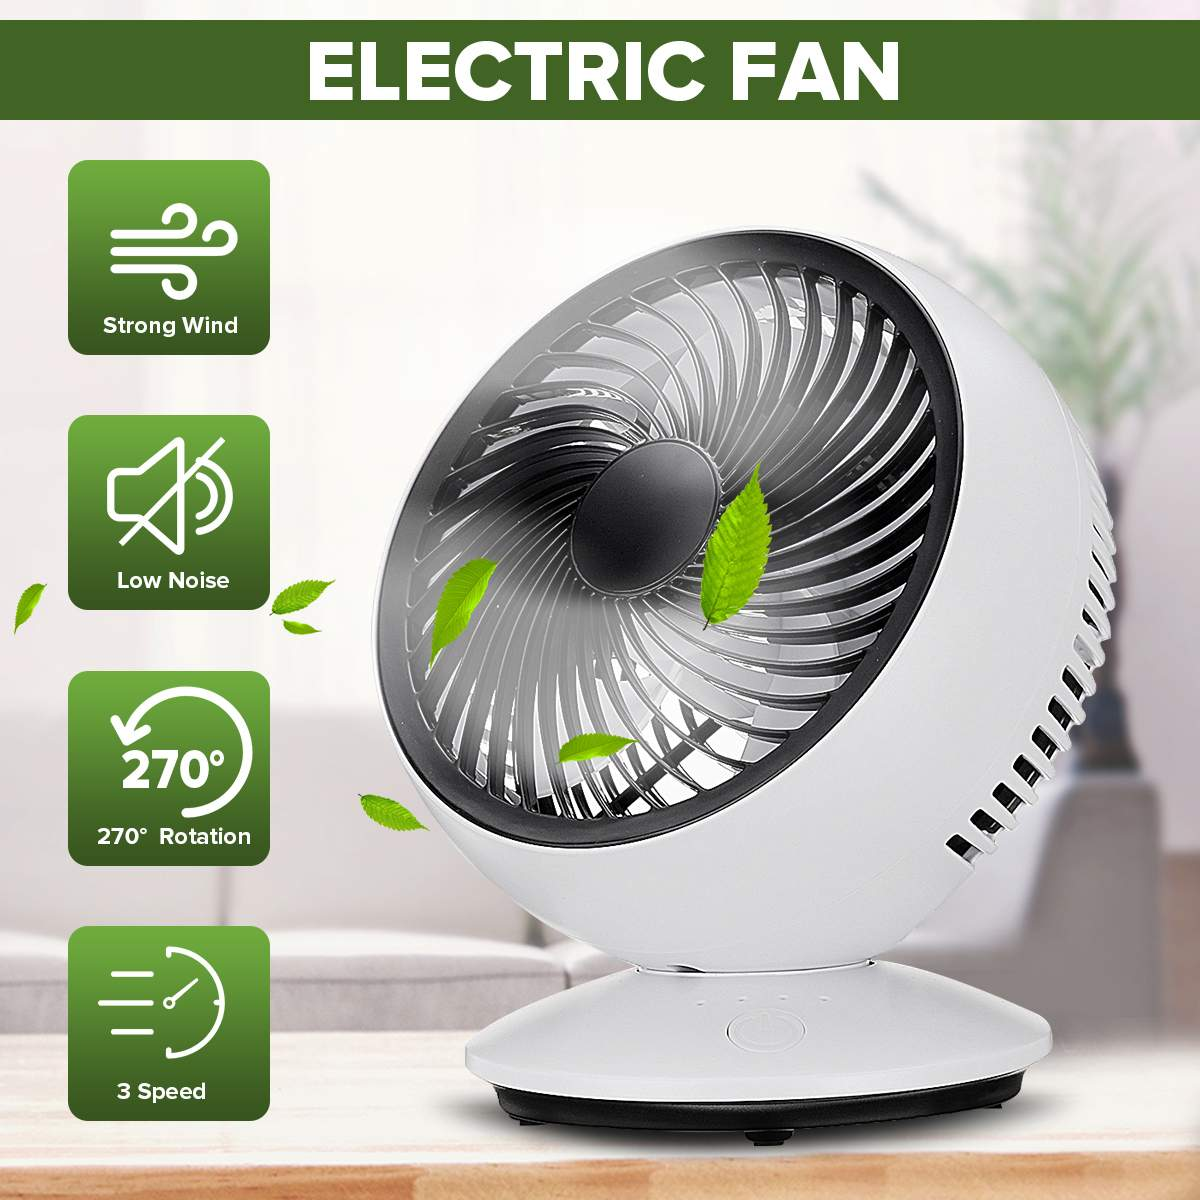 Dual Head USB Powered Mini Desk Fan for Car Home Office 360 Degree Rotatable Auto Fan 3 Speed Adjustable